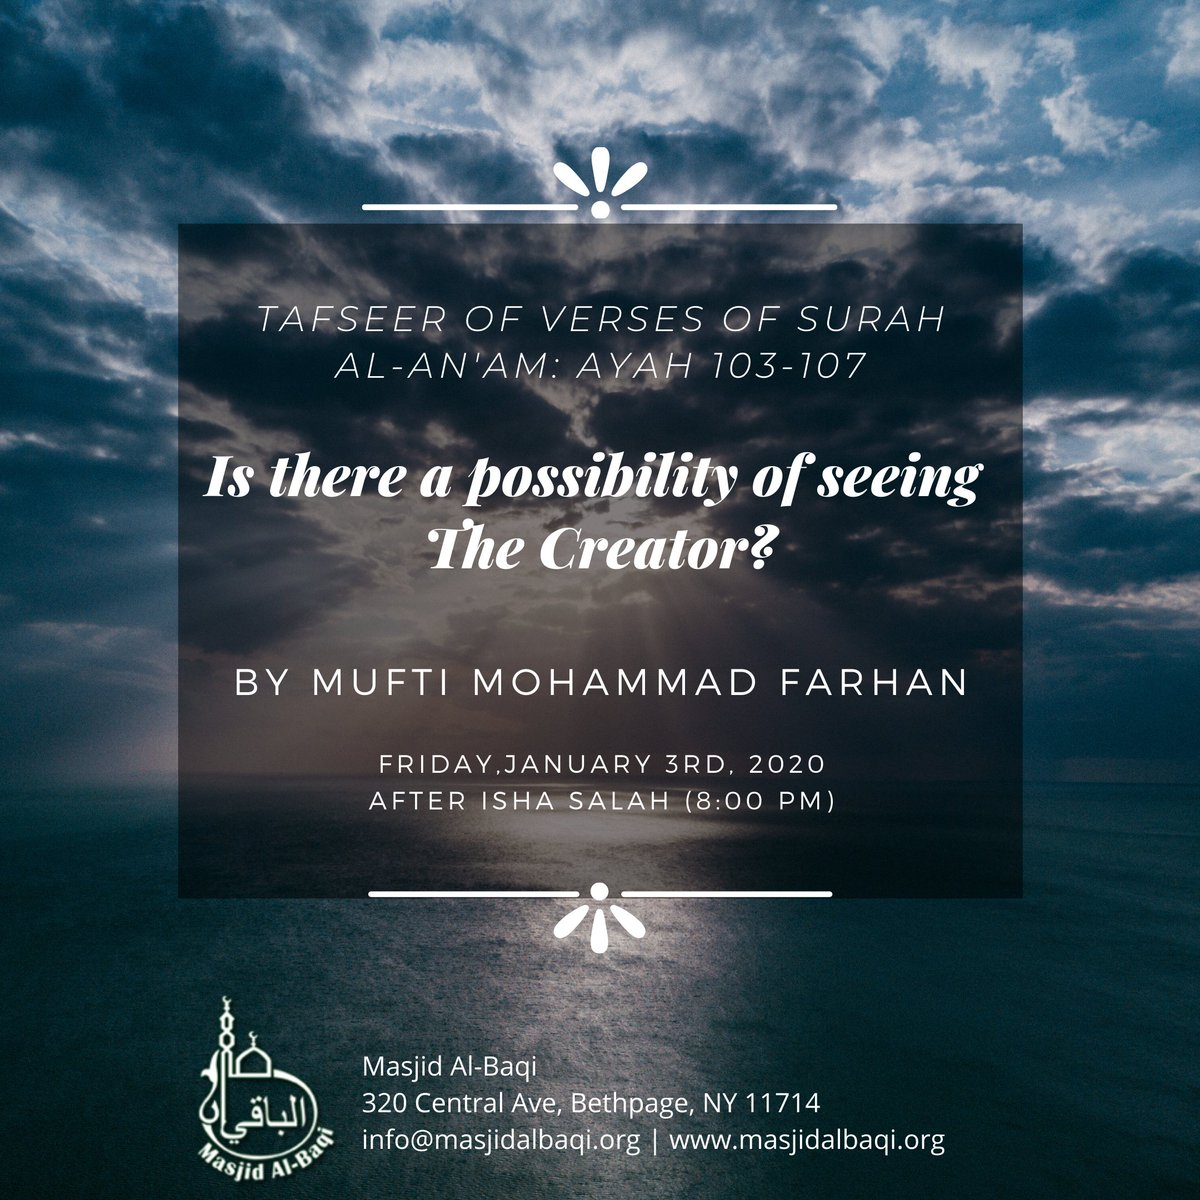 Masjid Albaqi (@masjidalbaqi) | Twitter throughout Isha Lunar Calendar 2020